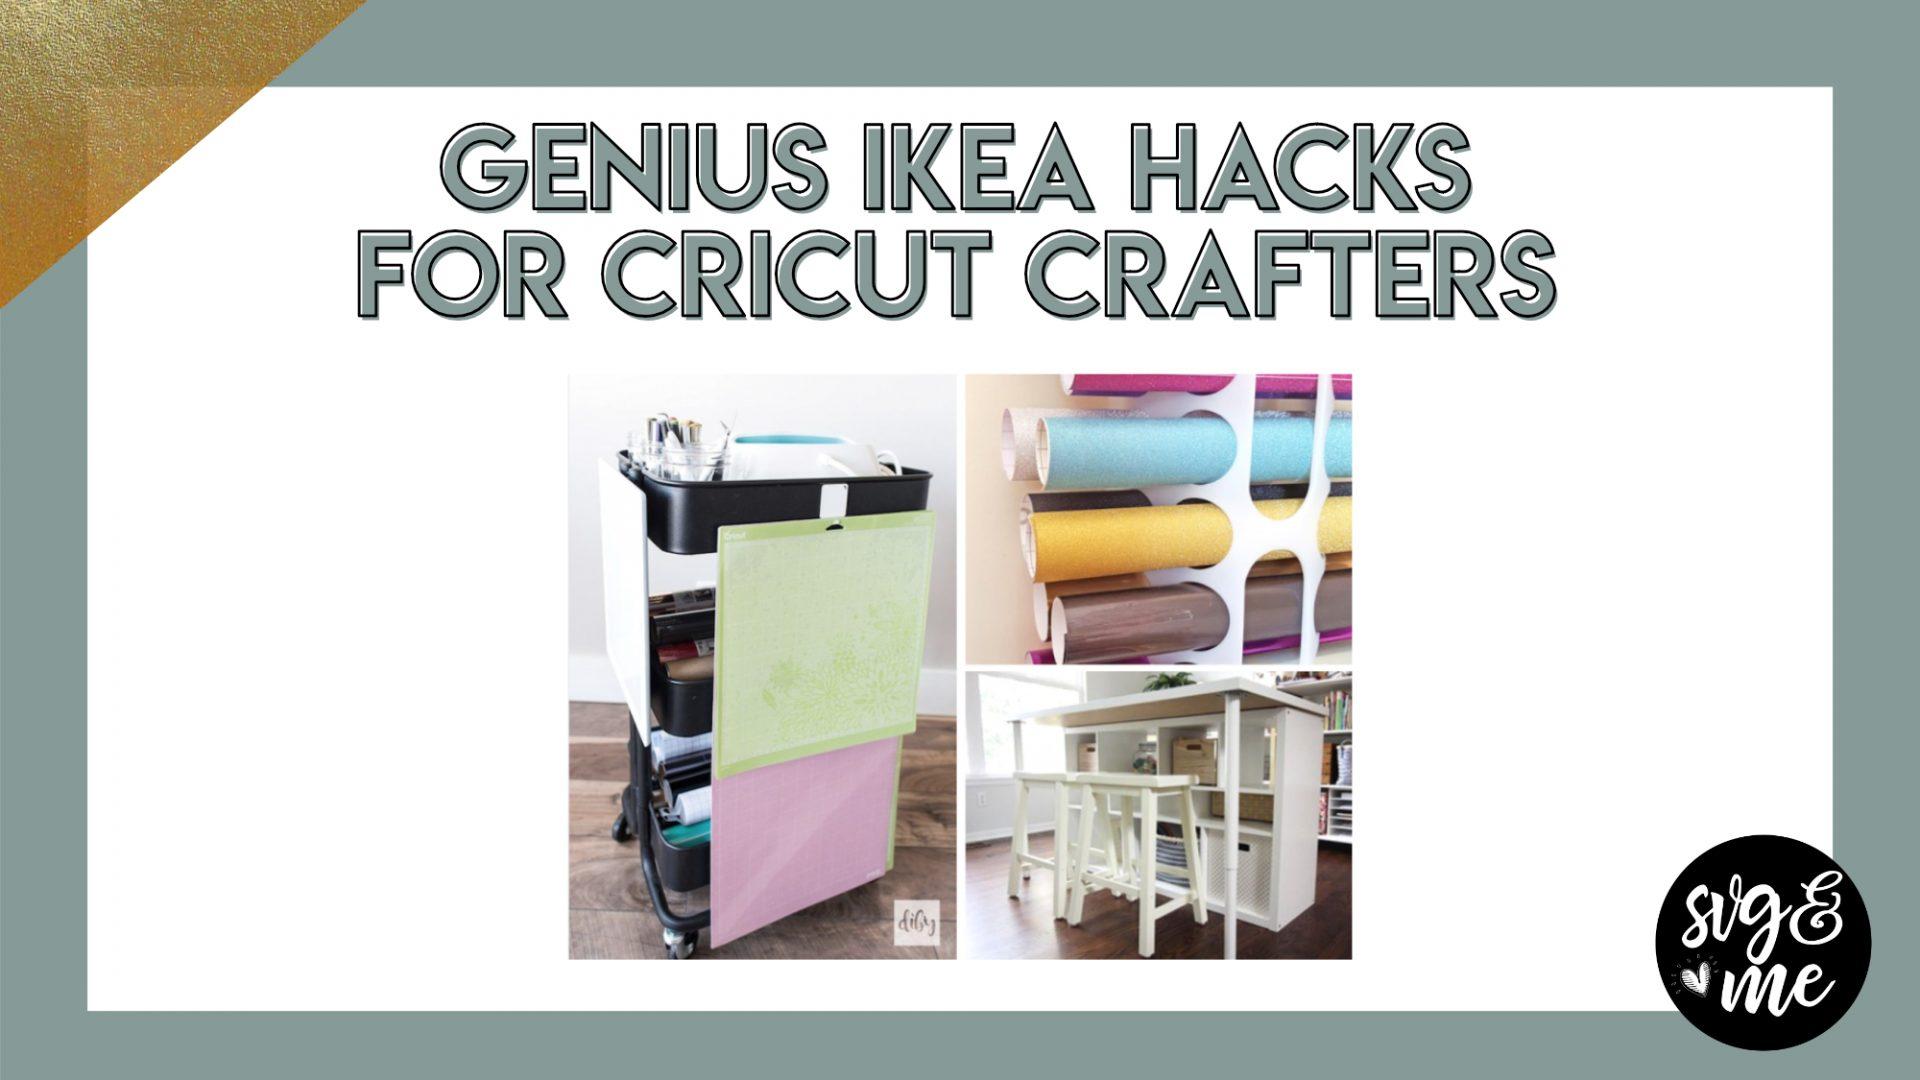 9 Genius Cricut Ikea Hacks For Crafters Svg Amp Me